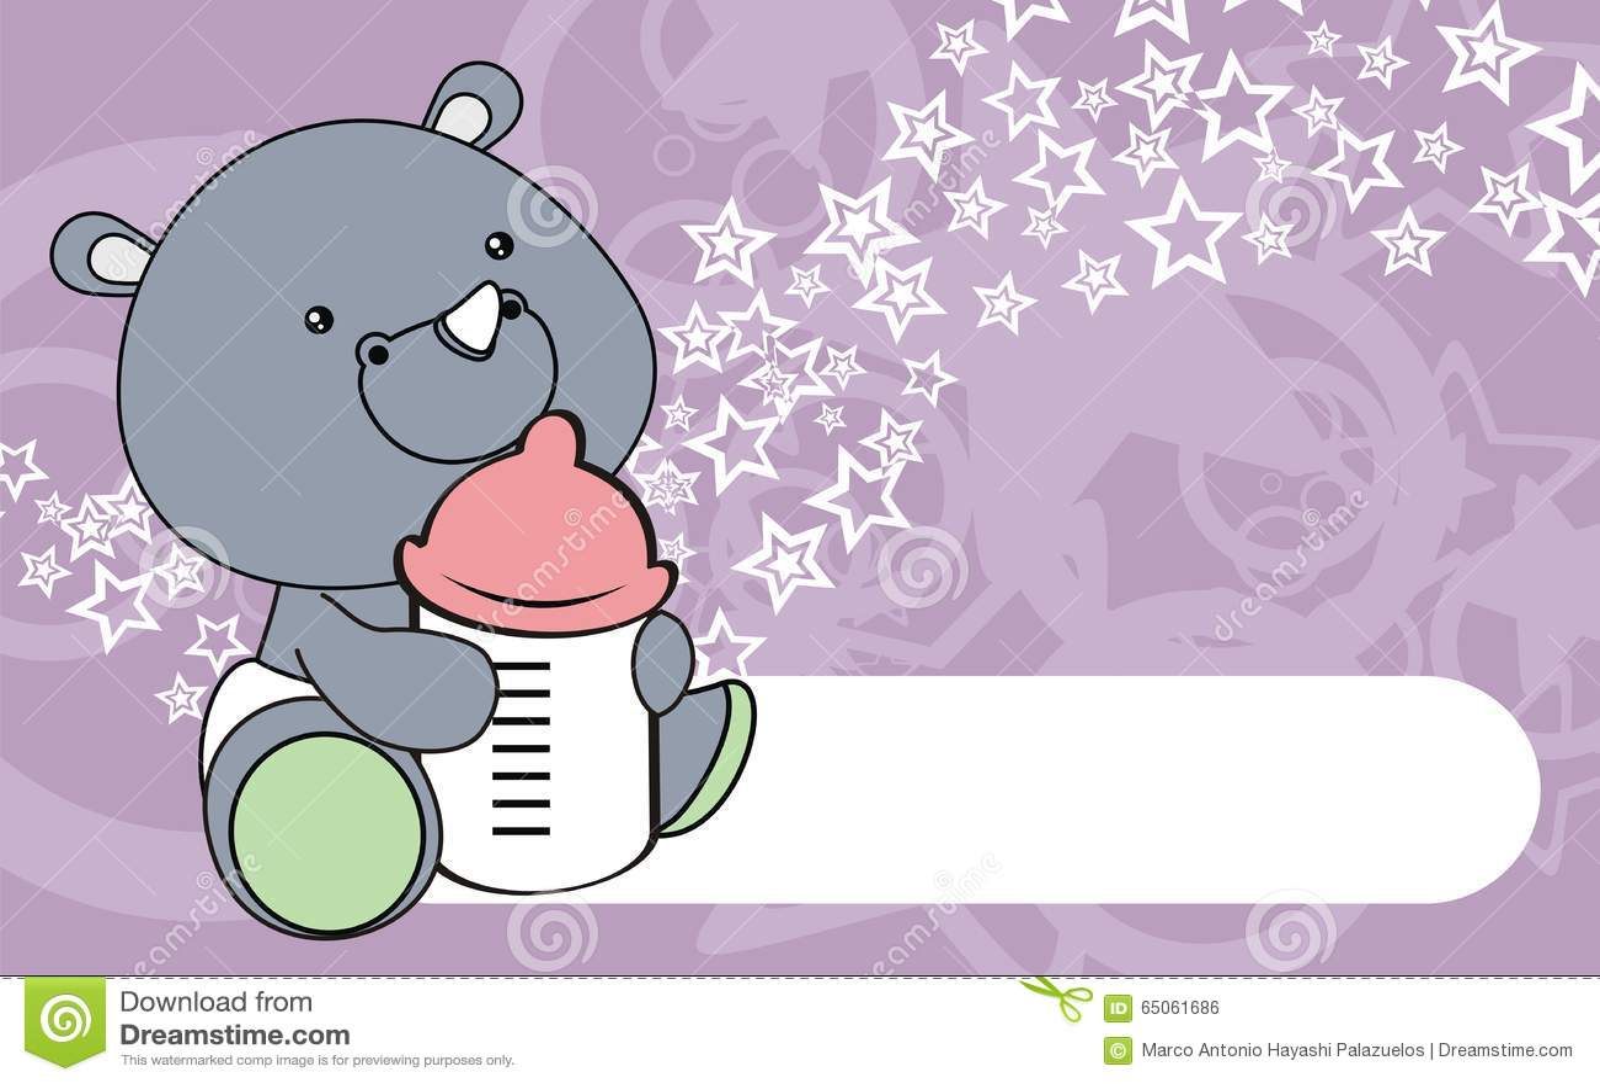 Cute rhino baby cartoon background stock vector illustration cute rhino baby cartoon background voltagebd Images